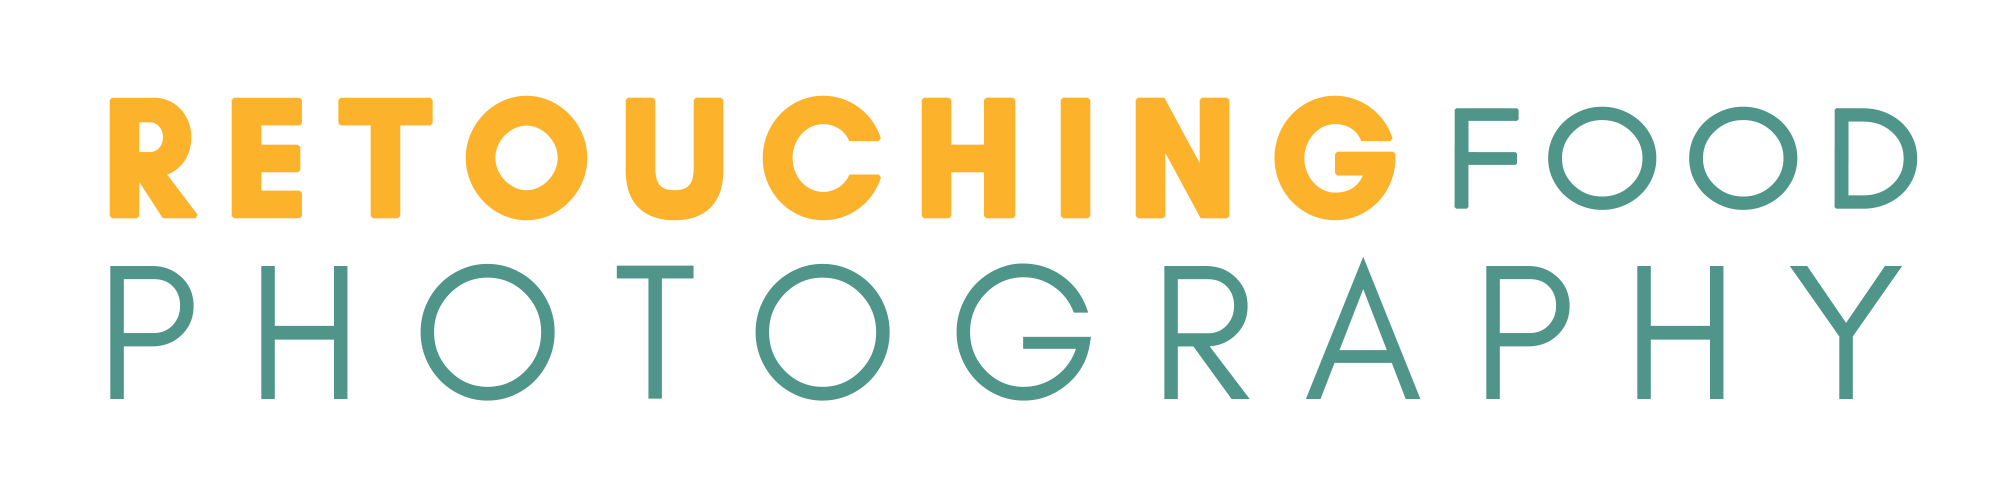 RetouchingFoodPhotography-logo.png